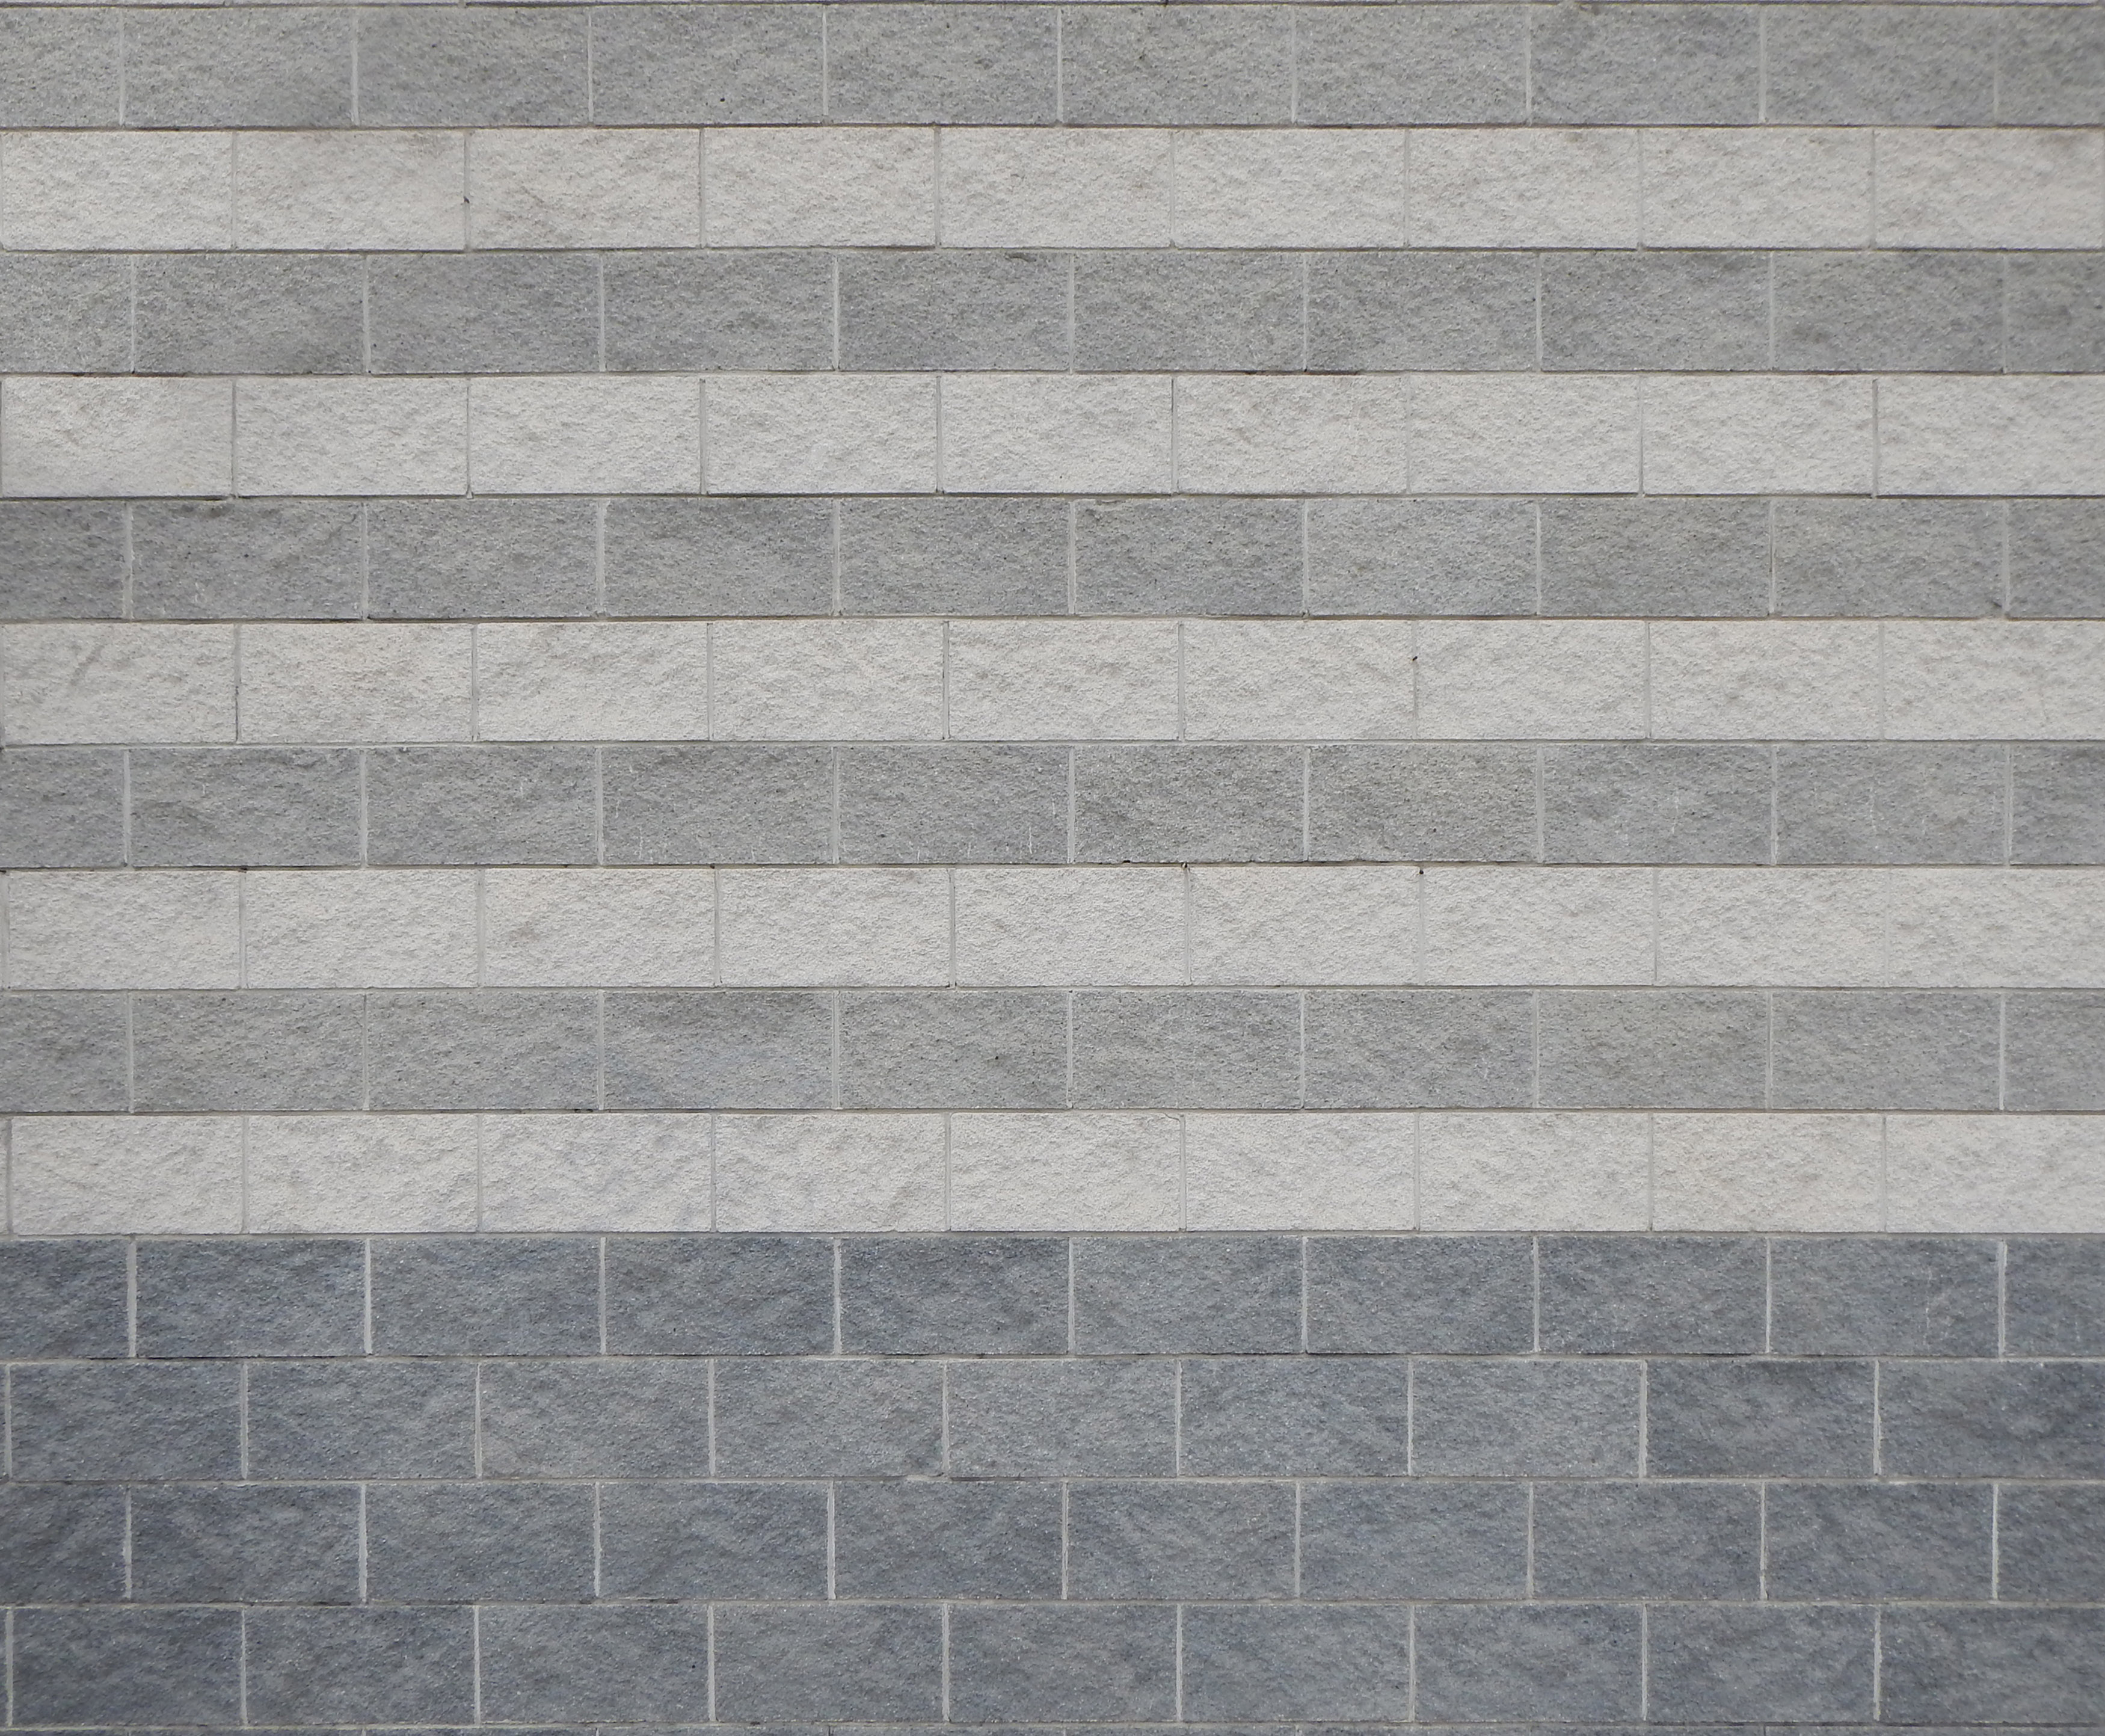 Free photo concrete tiles texture street texture - Grey bathroom floor tiles texture ...